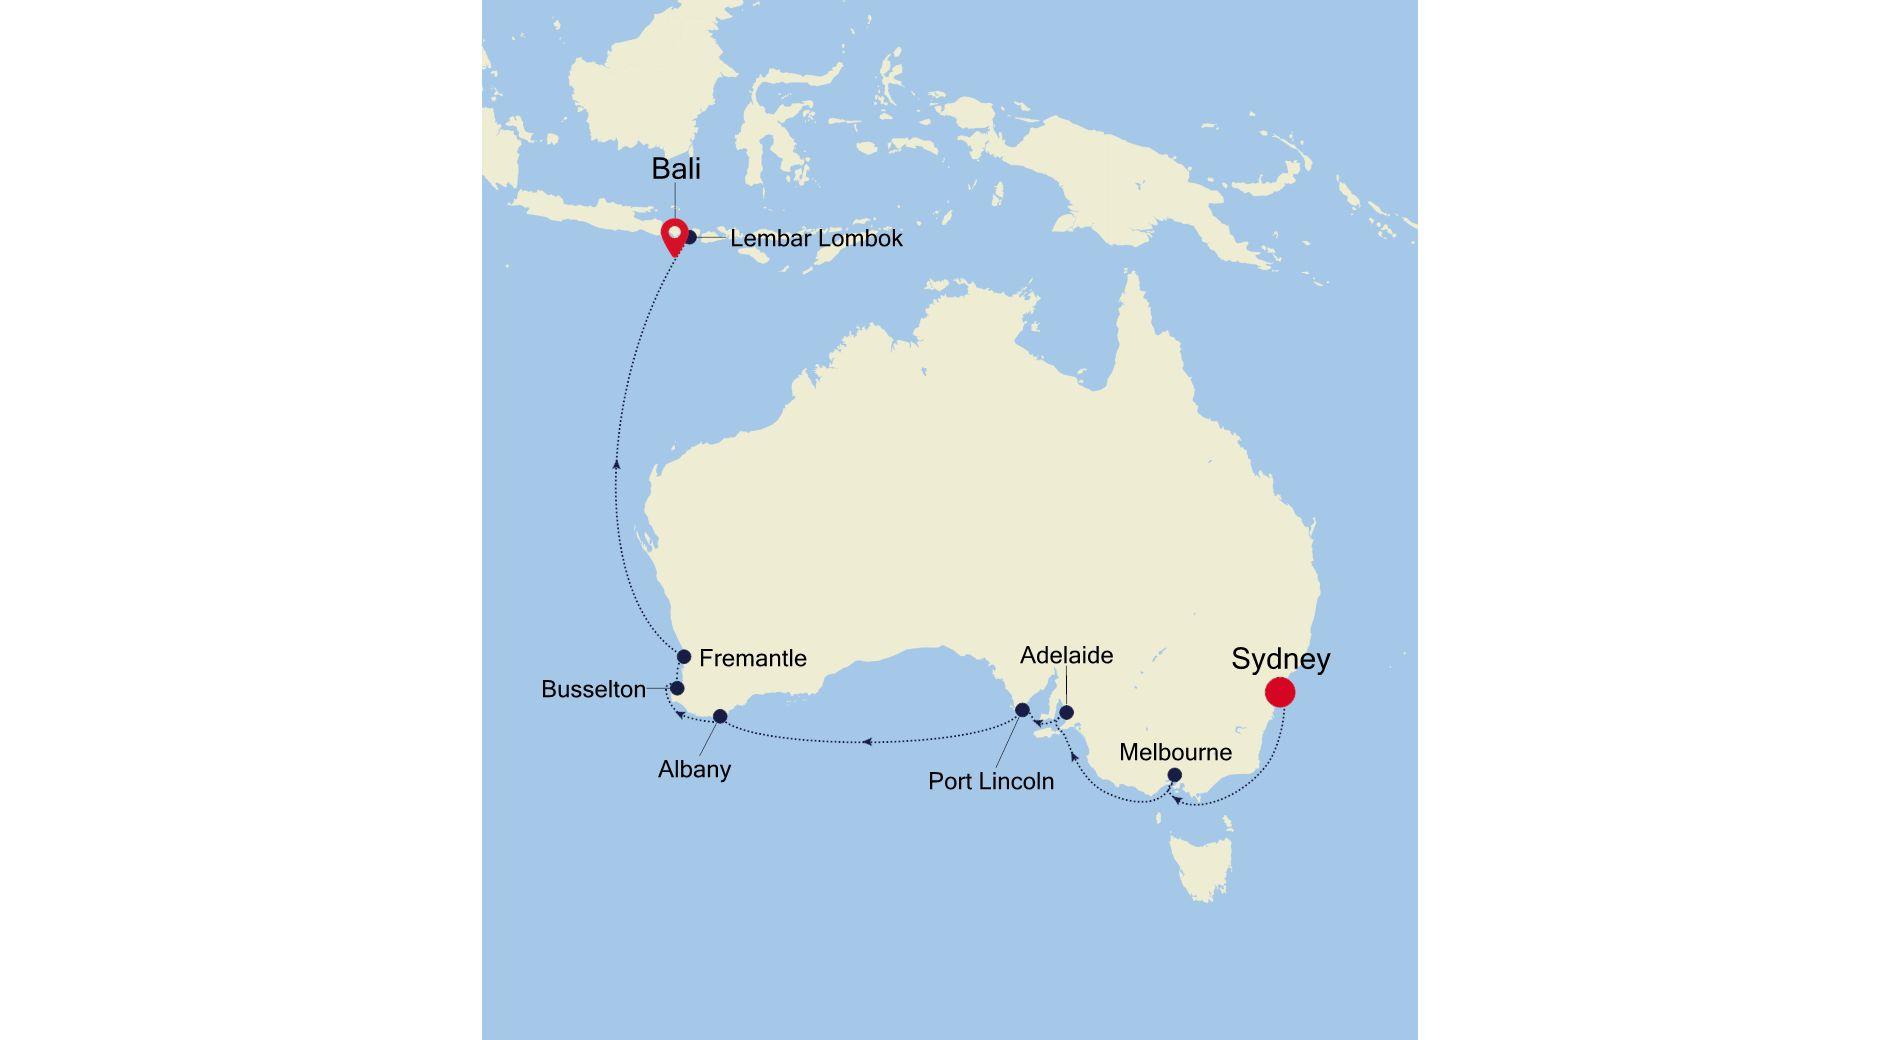 SM220219S15 - Sydney nach Bali